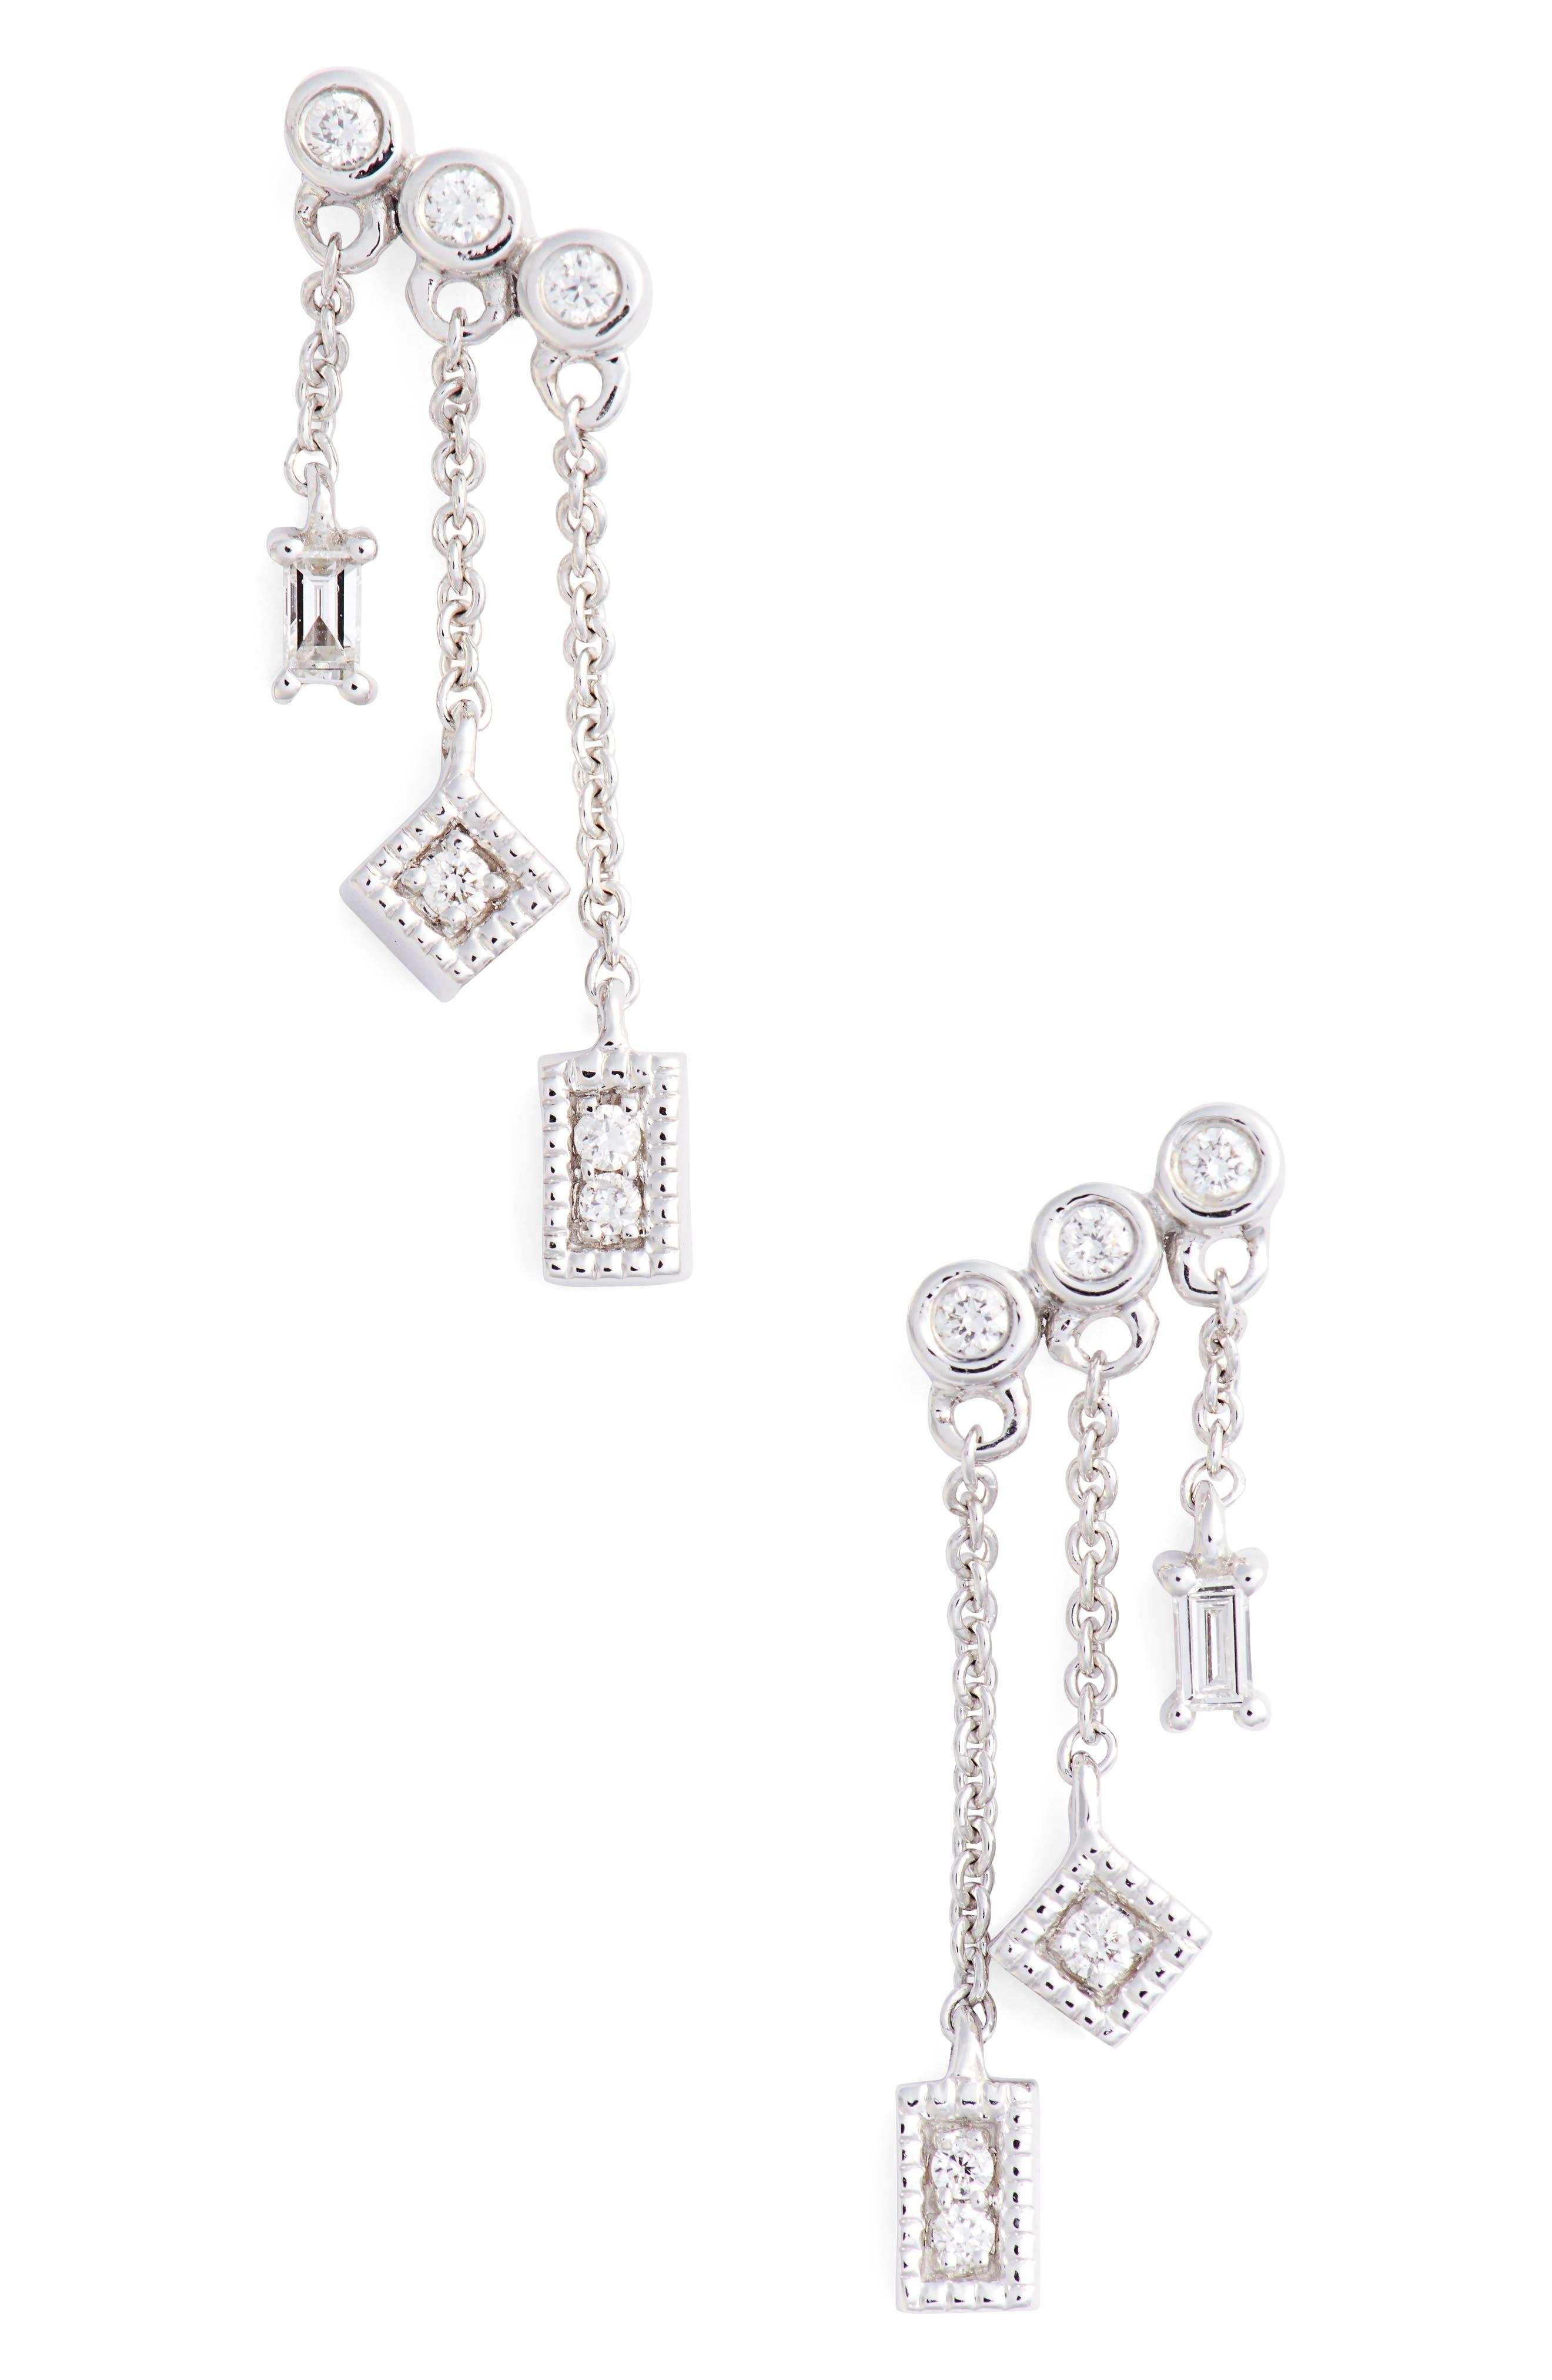 Dana Rebecca Designs Lisa Michelle Diamond Drop Earrings